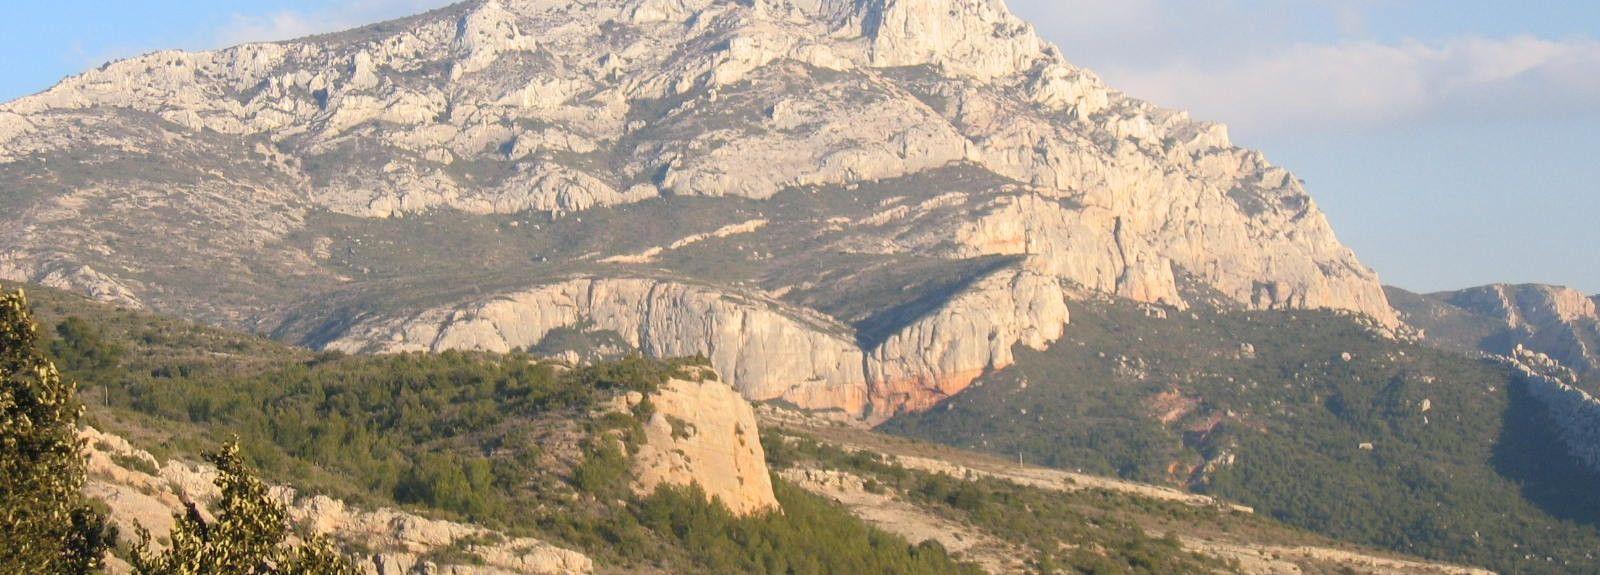 Aix-en-Provence historiske sentrum, Aix-en-Provence, Provence-Alpes-Côte d'Azur, Frankrike